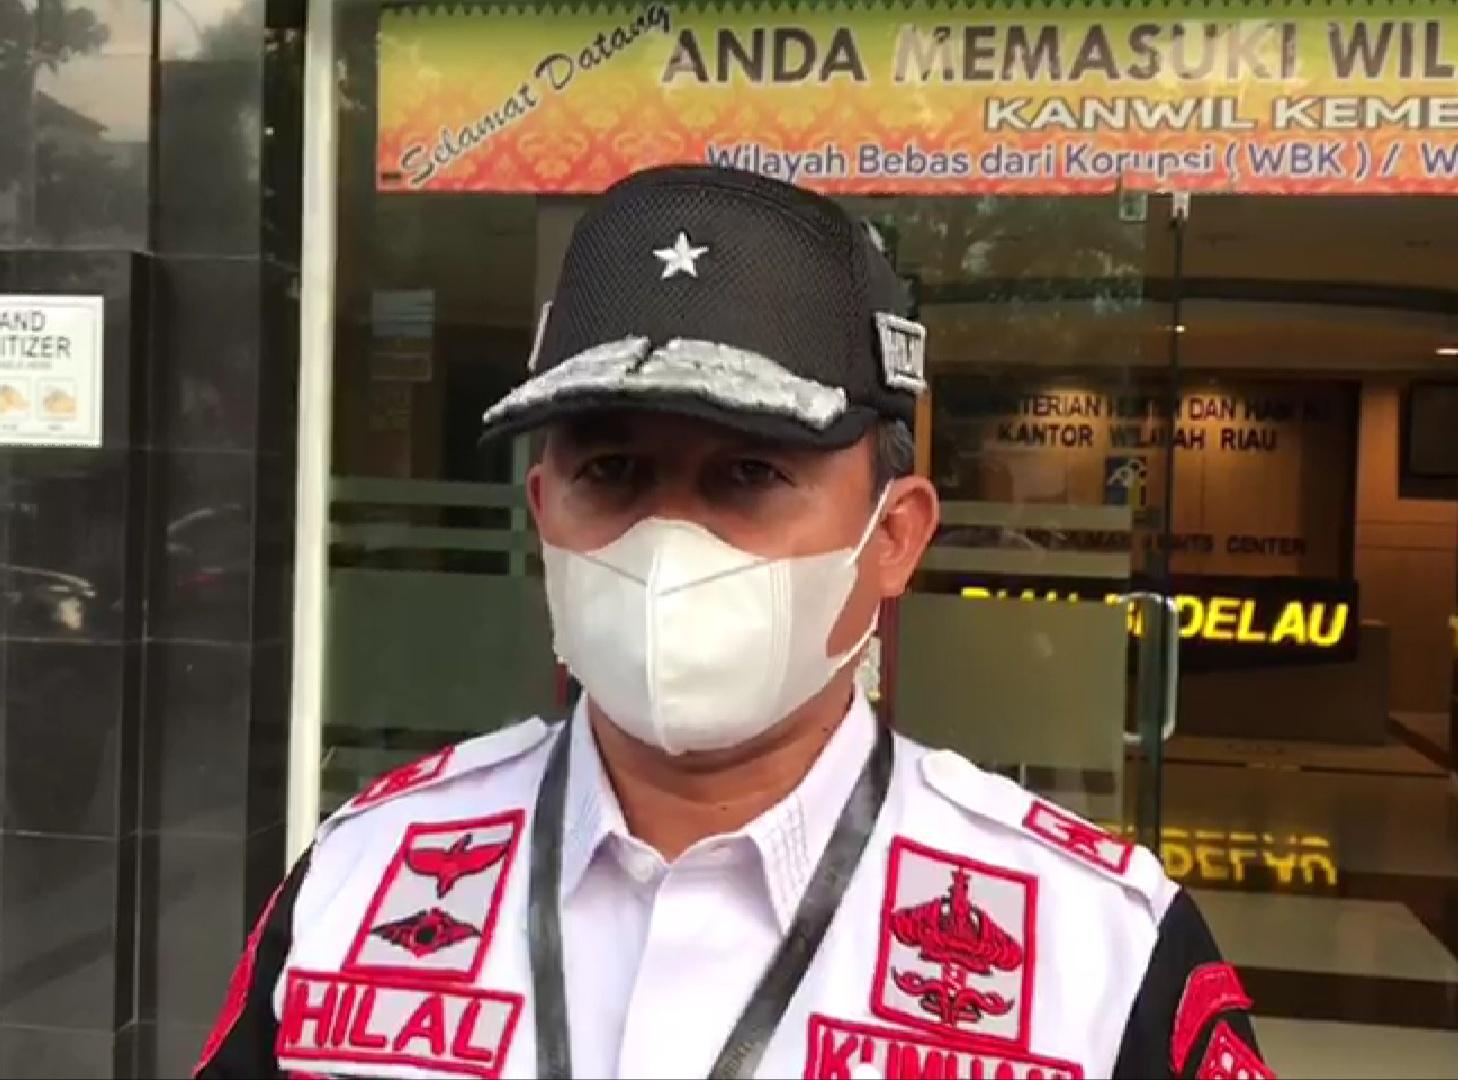 533 Warga Binaan se-Riau Positif Covid-19